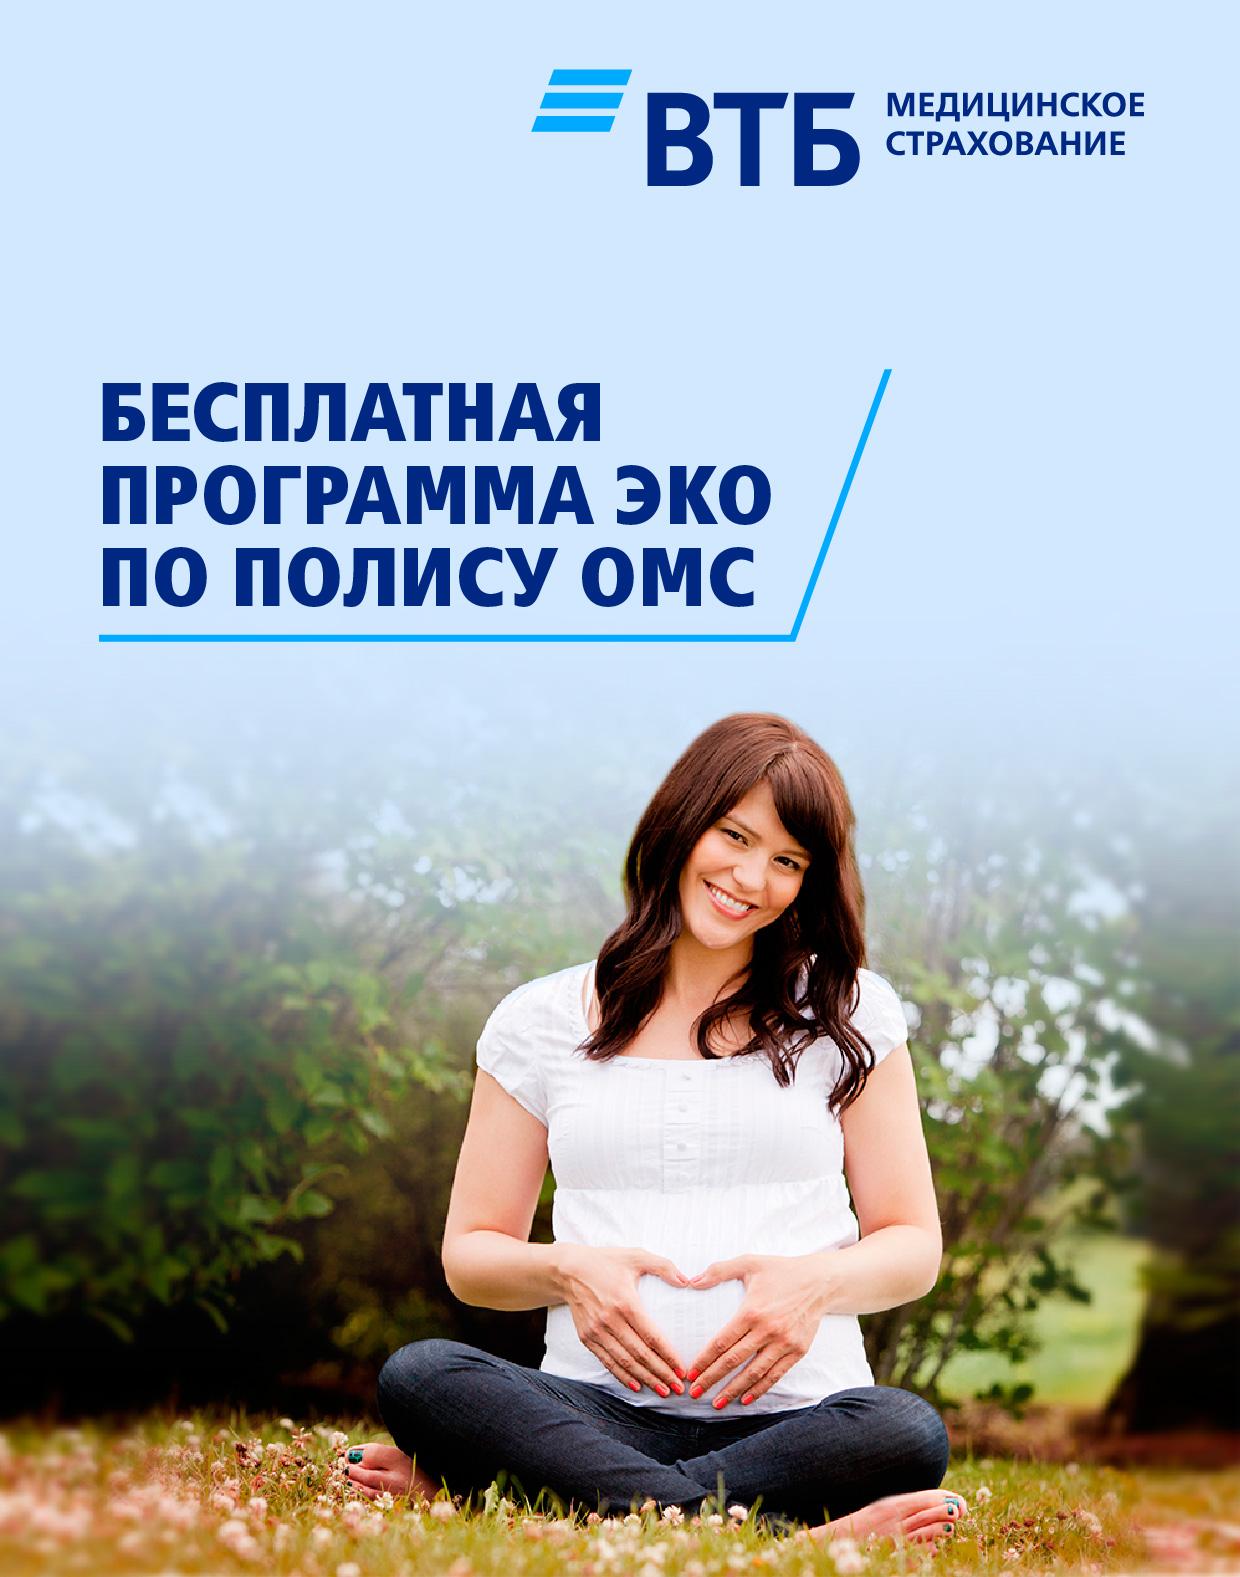 Процедура ЭКО - шанс на рождение ребёнка